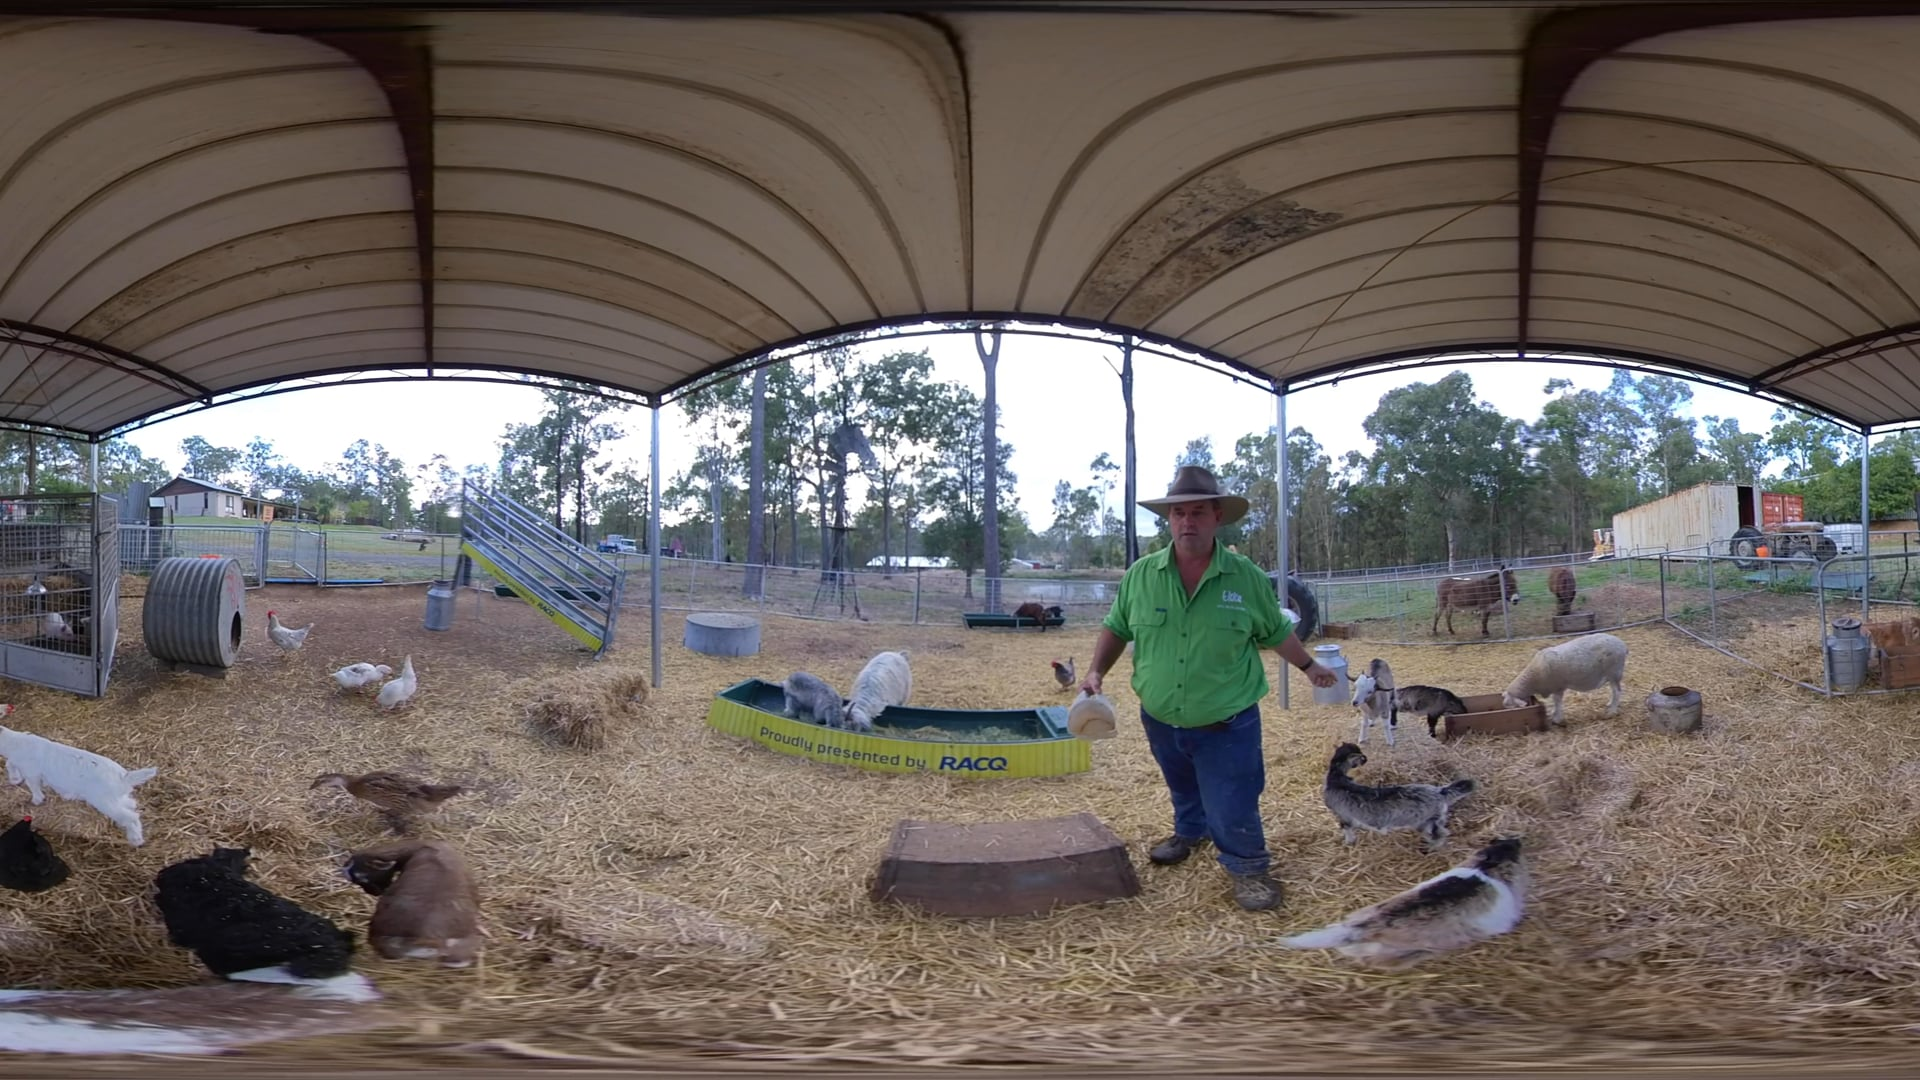 Day 9 | 360 Animal Nursery